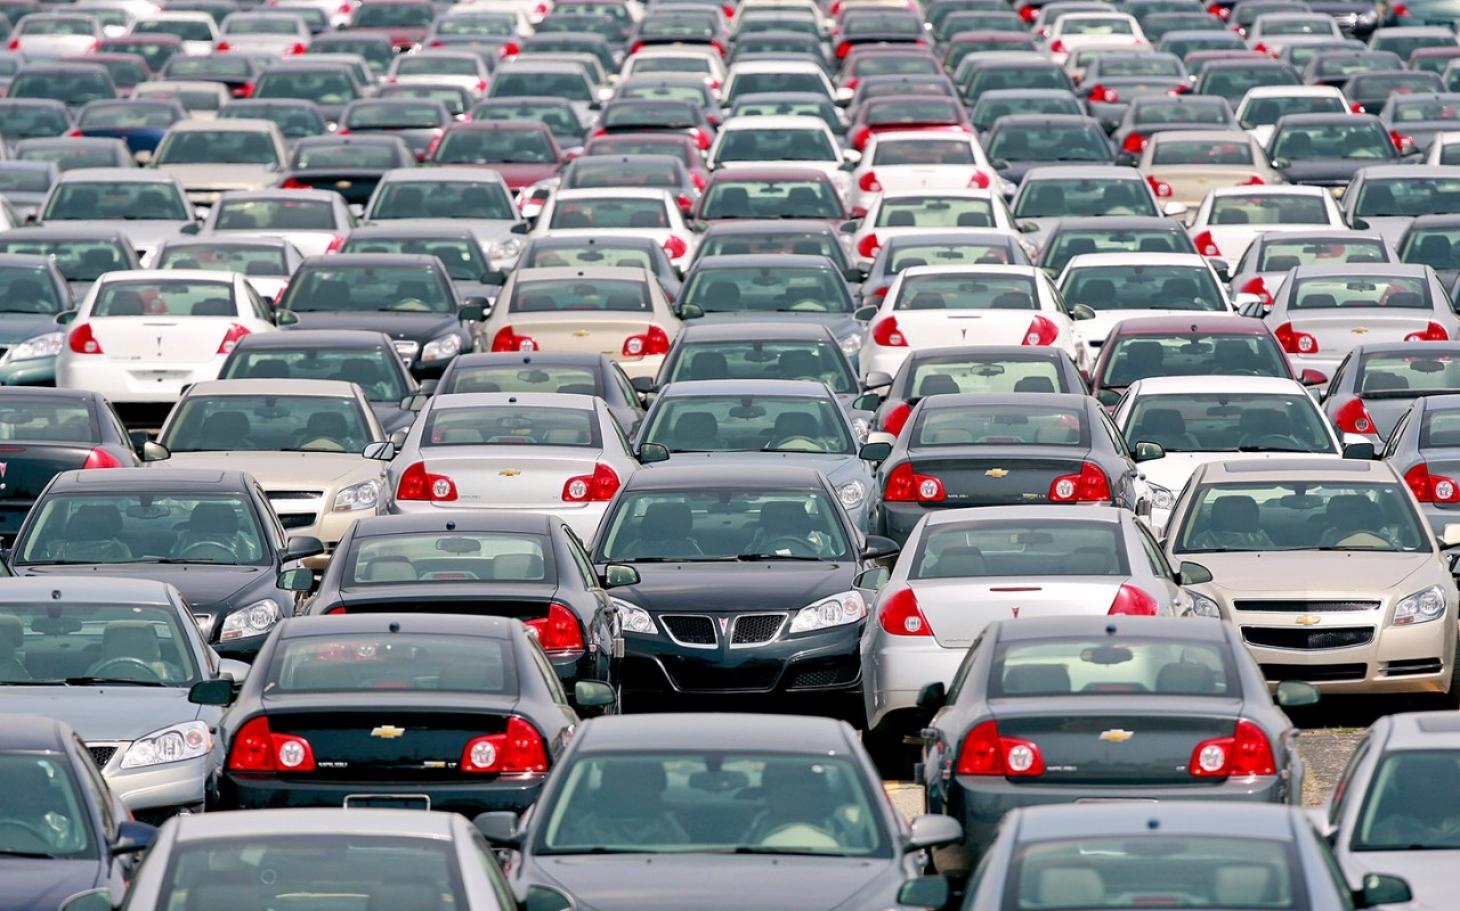 Gm Recalls 27 Million Cars For Tail Light, Brake Problems